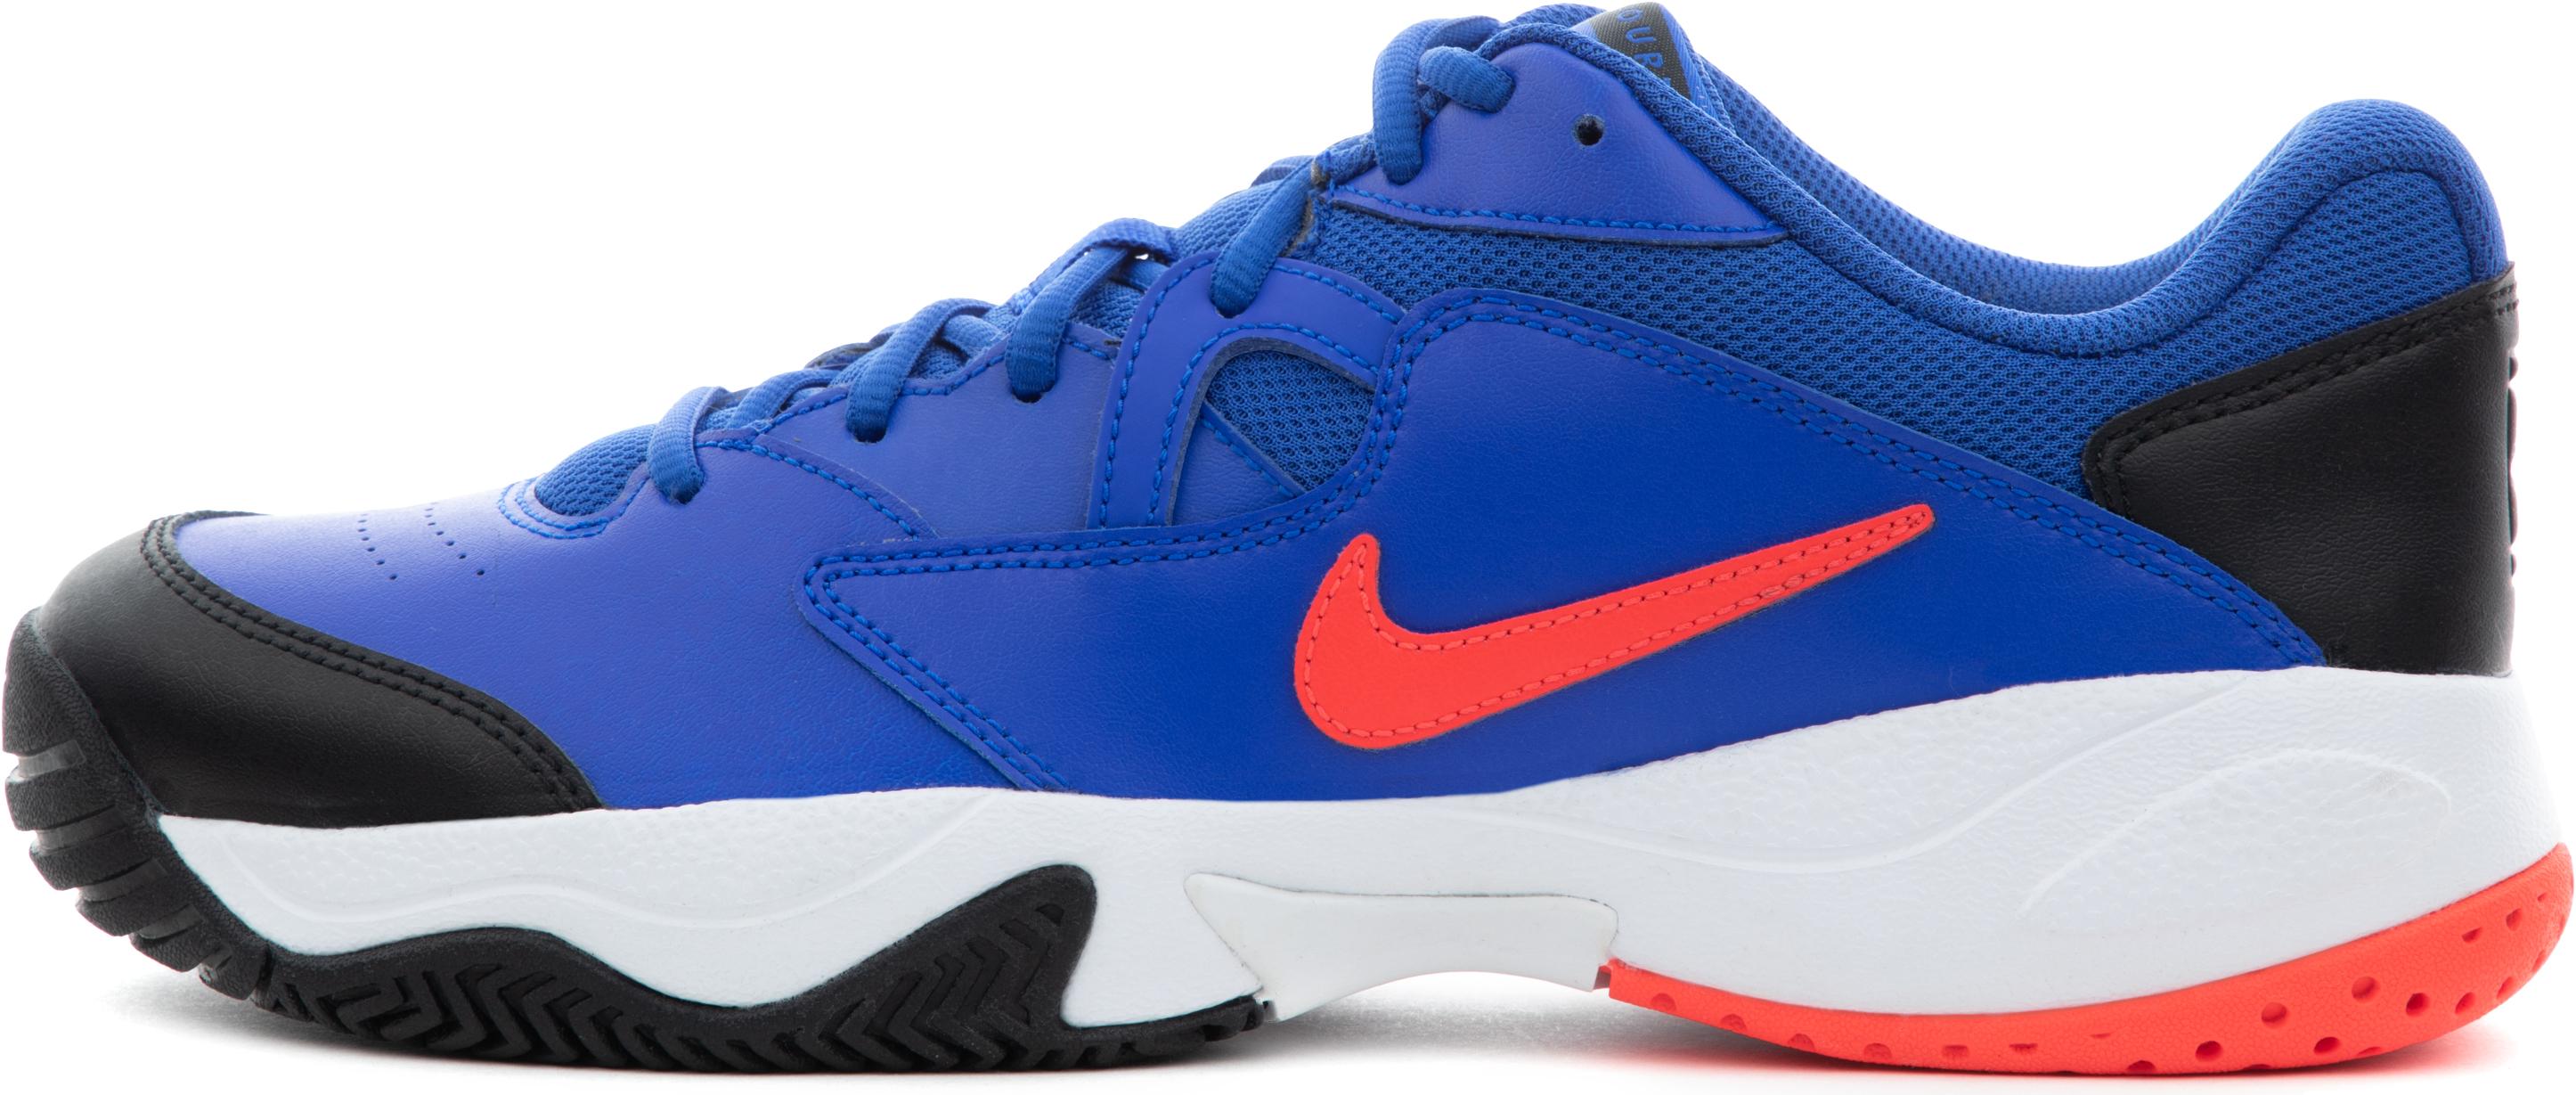 Nike Кроссовки мужские Nike Court Lite 2, размер 46,5 nike кроссовки для мальчиков nike city court 7 размер 31